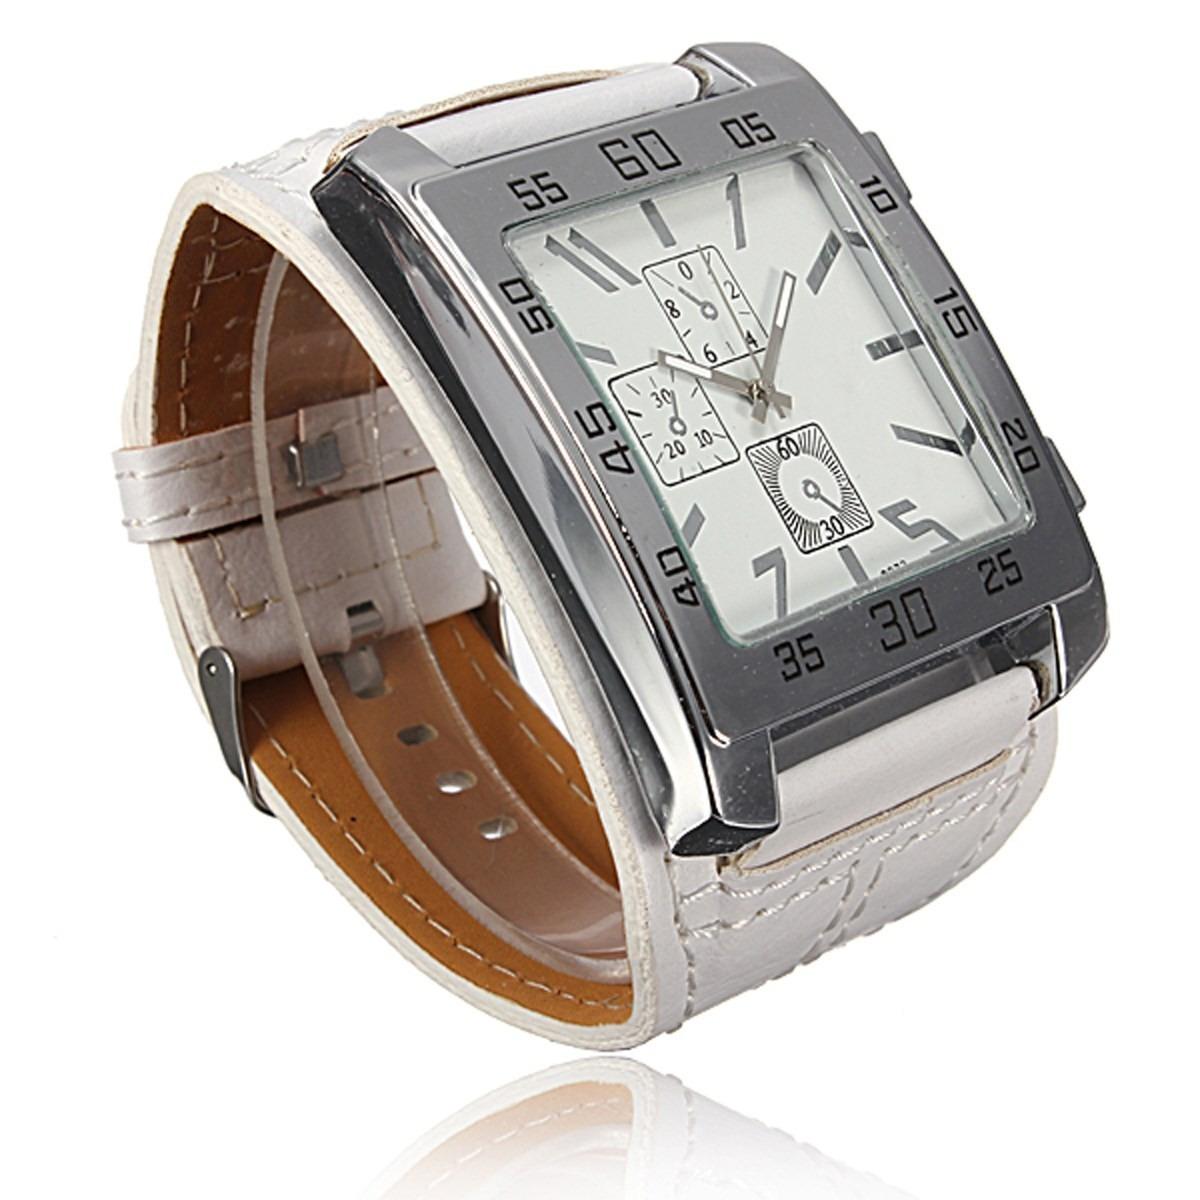 929f5eee765 Relogio Masculino Feminino Bracelet Quadrado Branco Ad1223 - R  120 ...